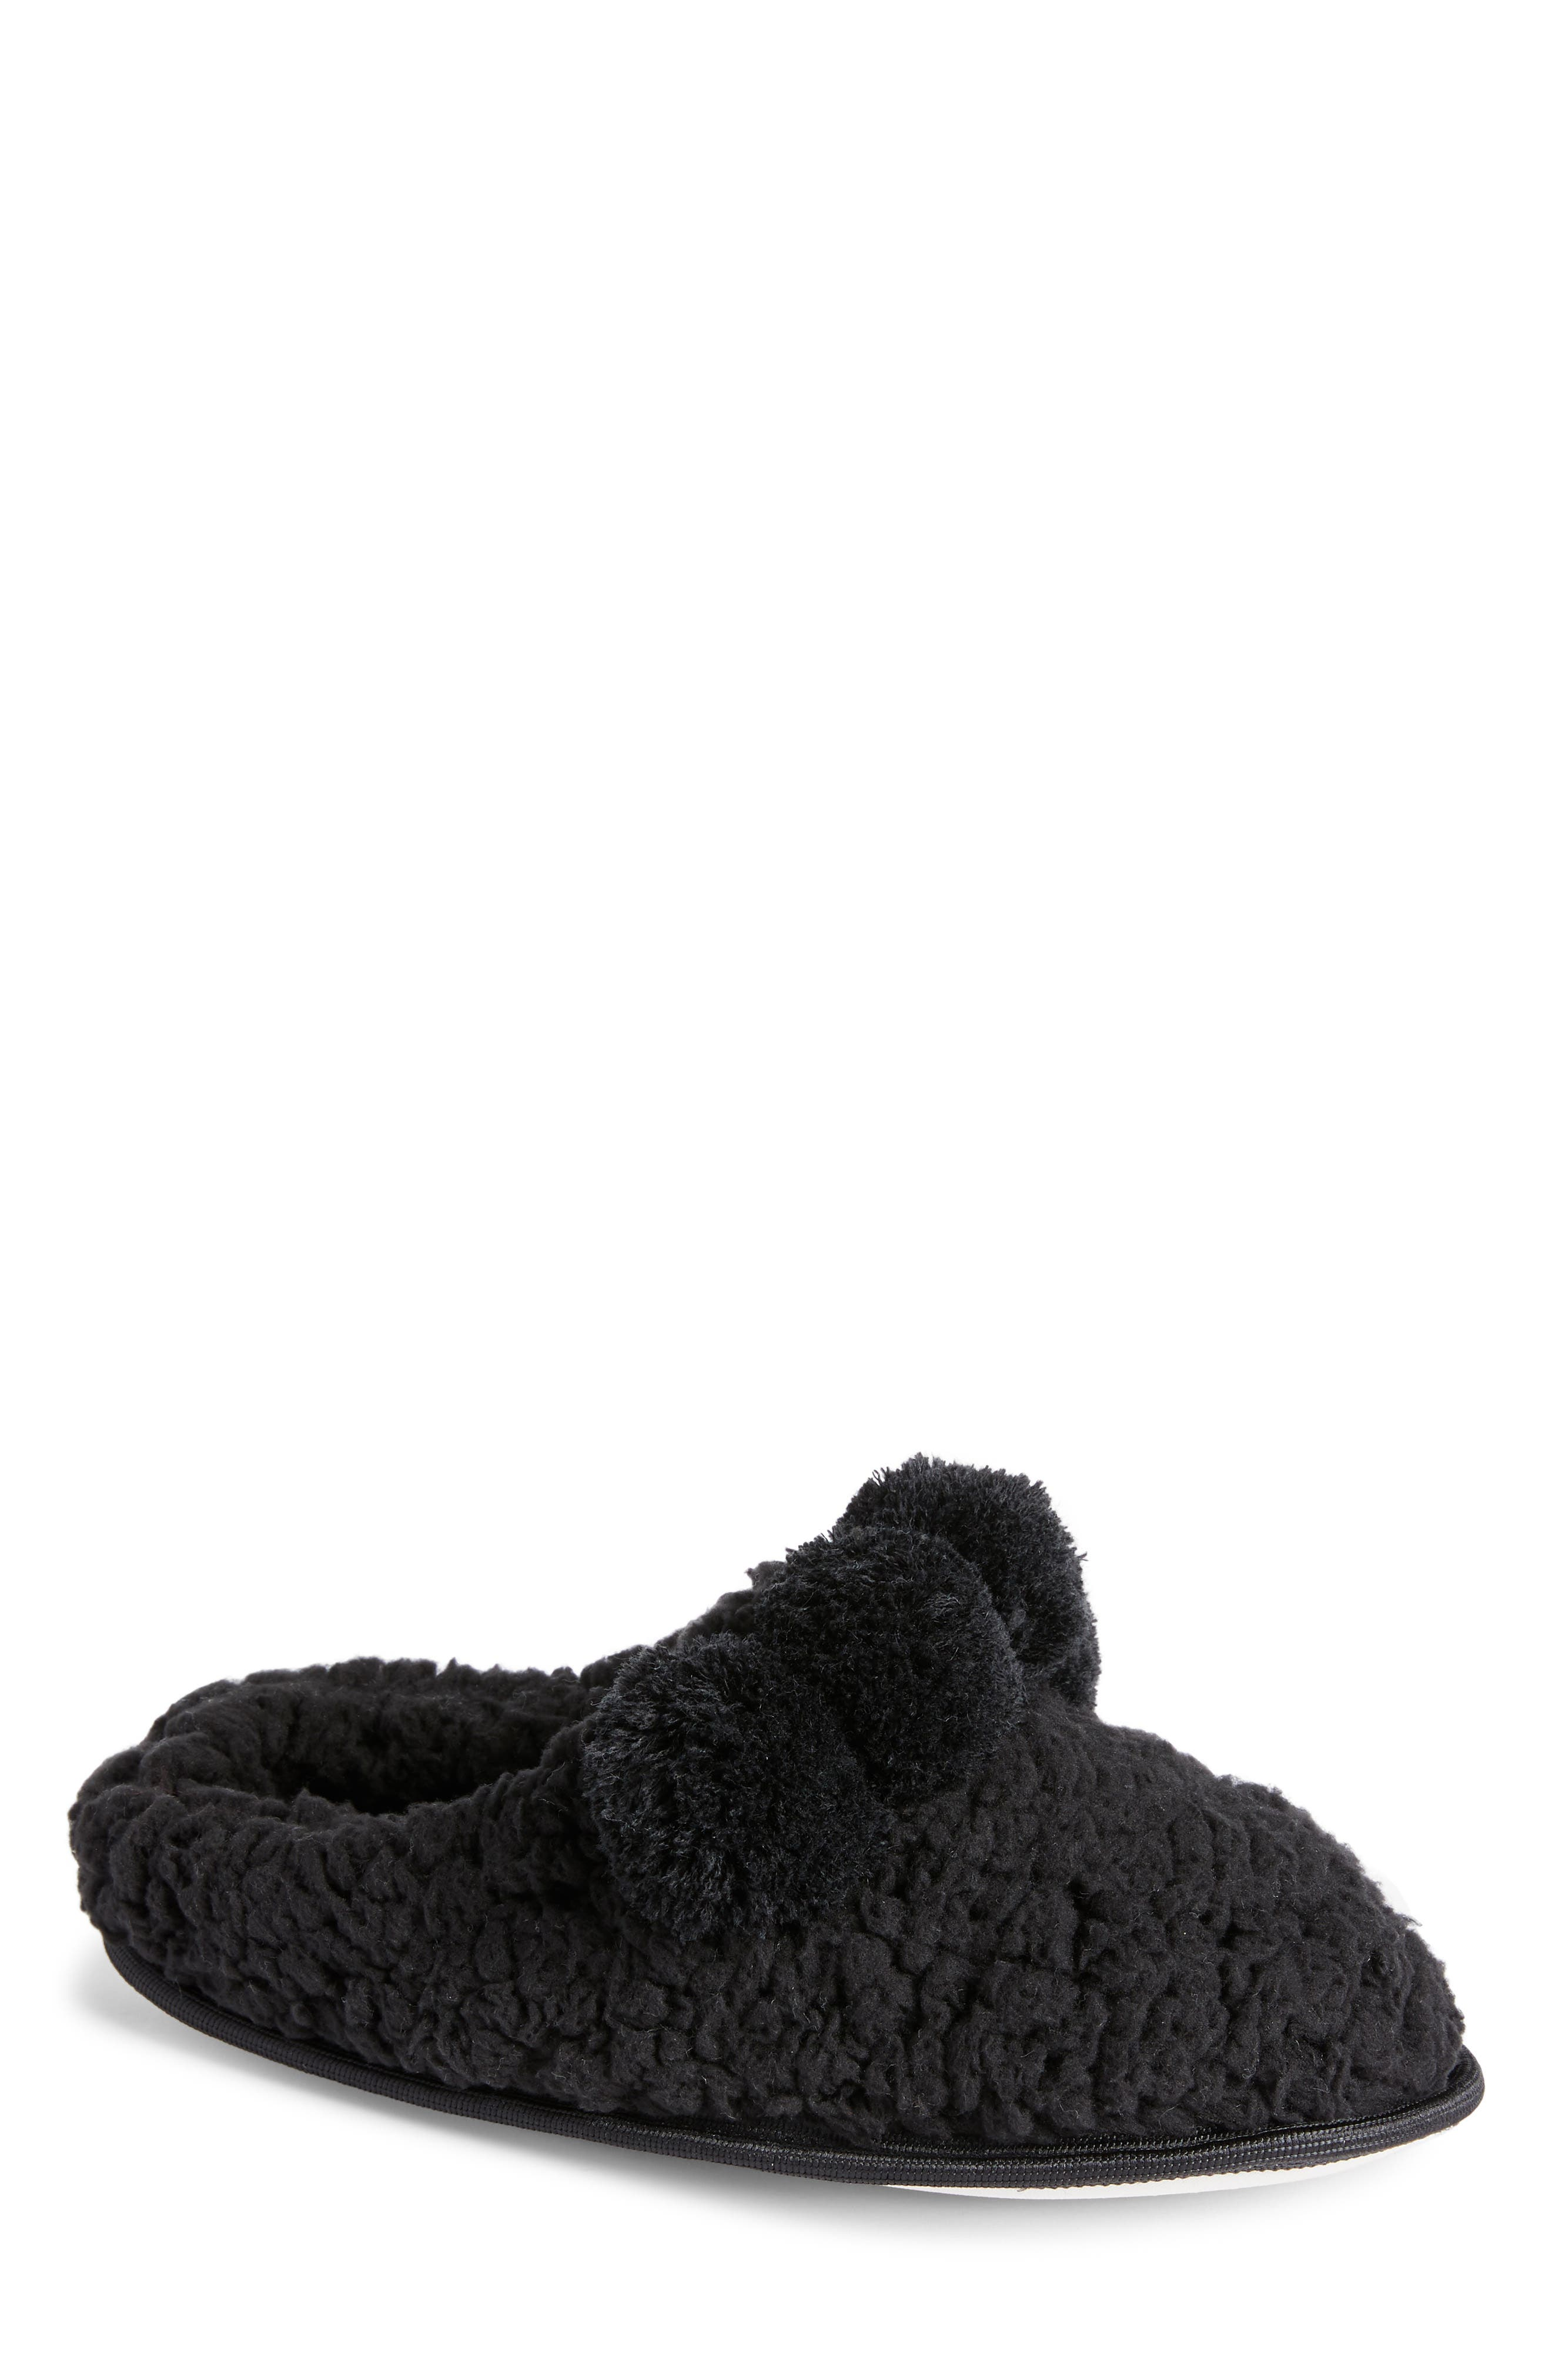 Pom Faux Shearling Scruff Slipper,                             Main thumbnail 1, color,                             BLACK MULTI